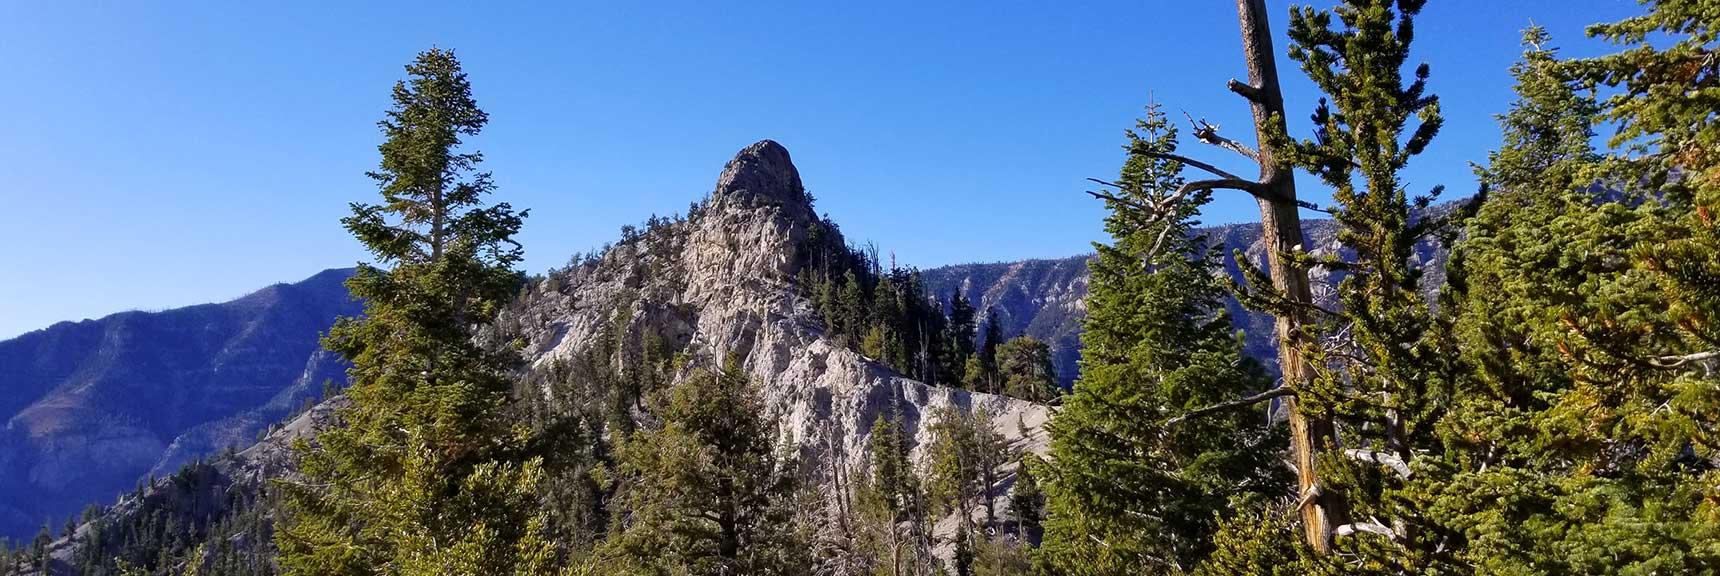 Cockscomb Ridge/Peak | Mt Charleston Wilderness | Spring Mountains, Nevada